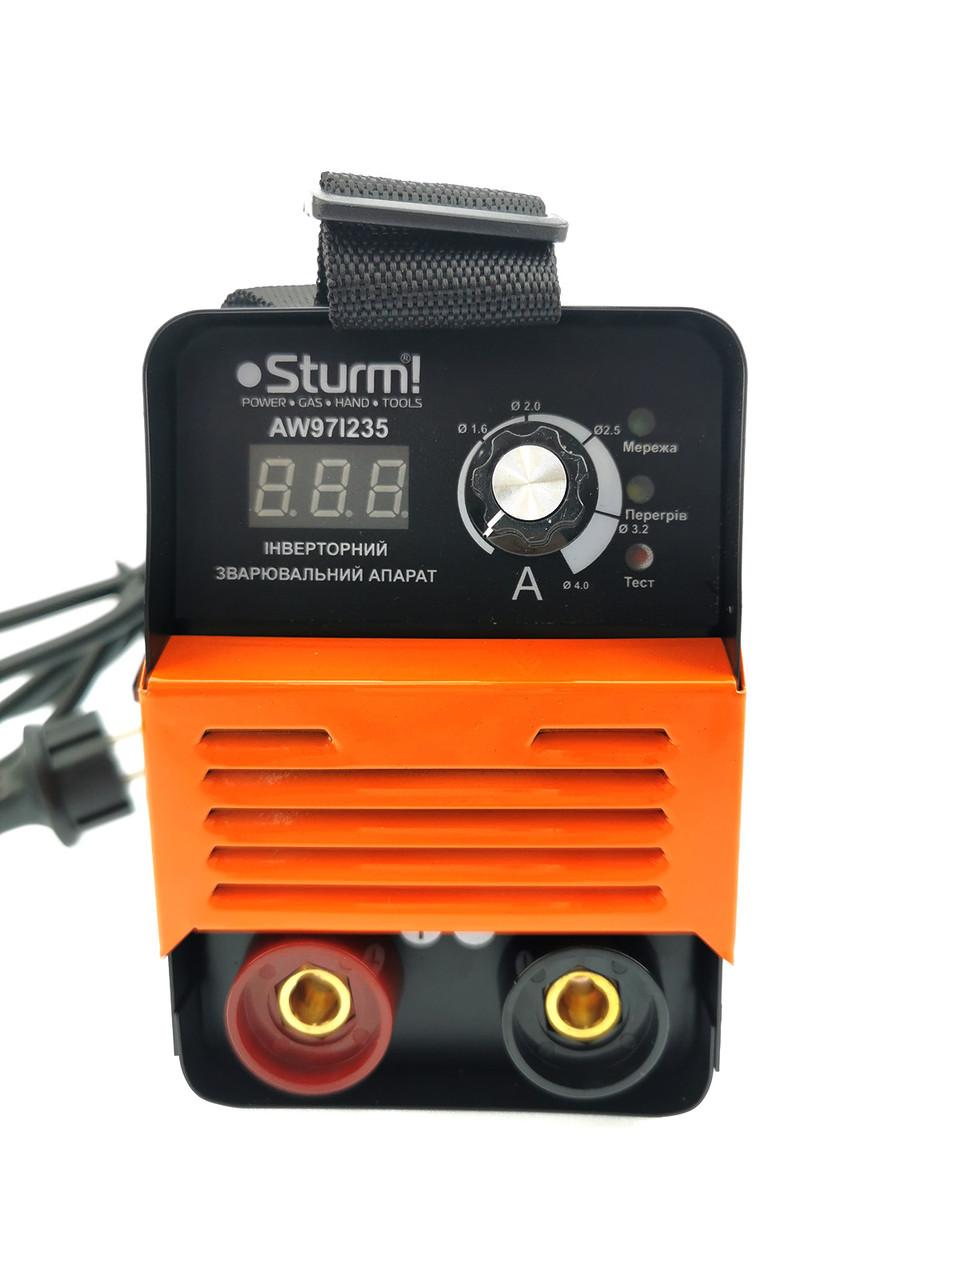 Сварочный аппарат Sturm AW97I235 235 A